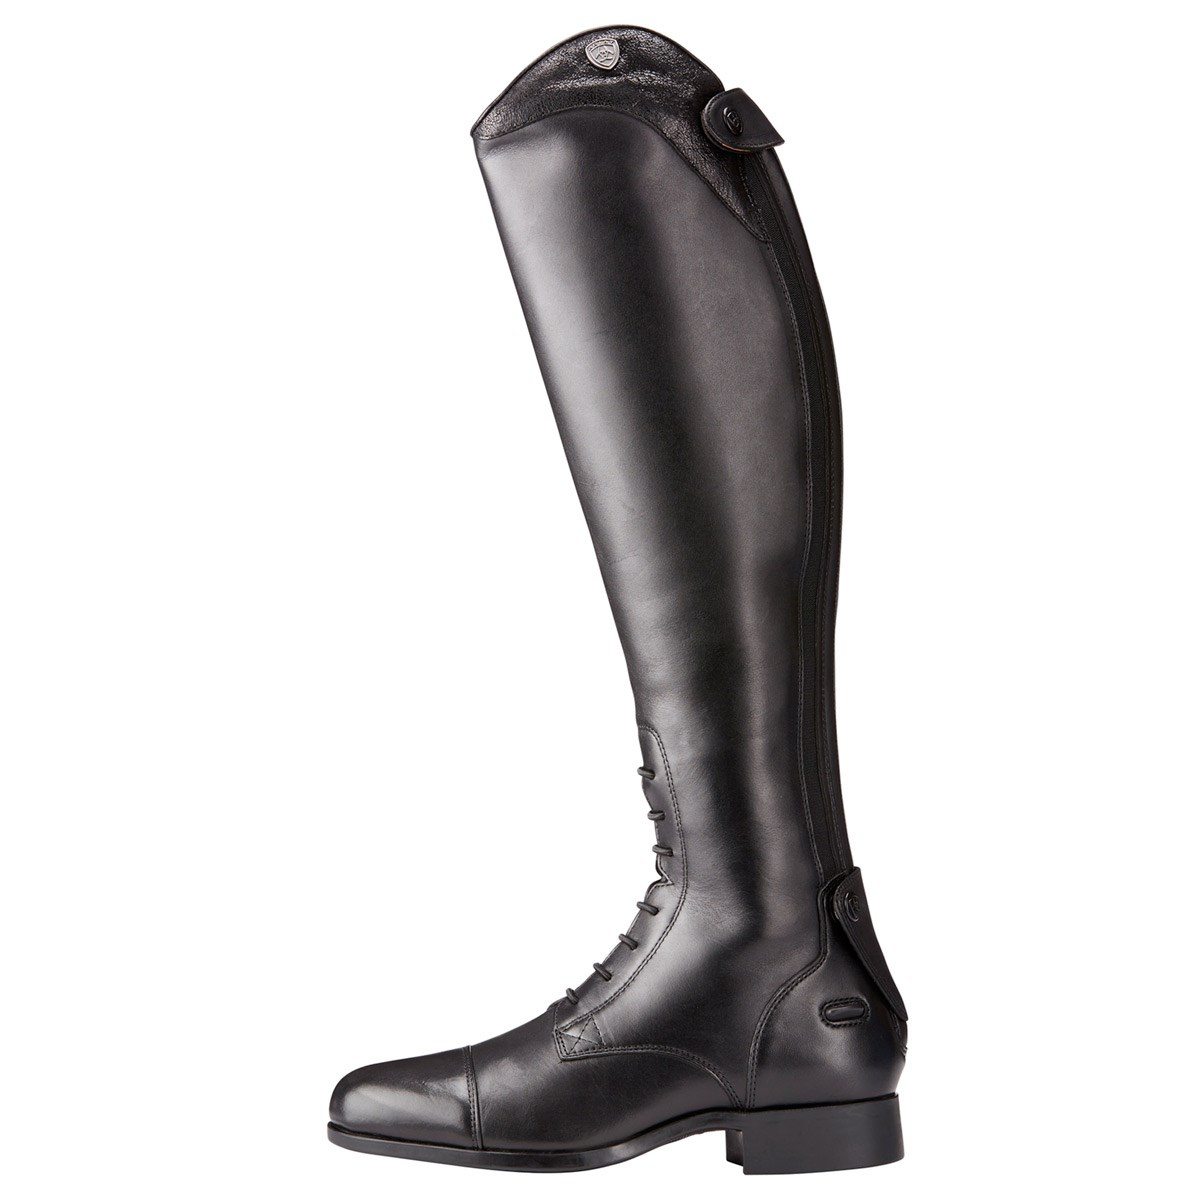 Ariat Heritage Ii Ellipse Ladies Tall Riding Boots Black